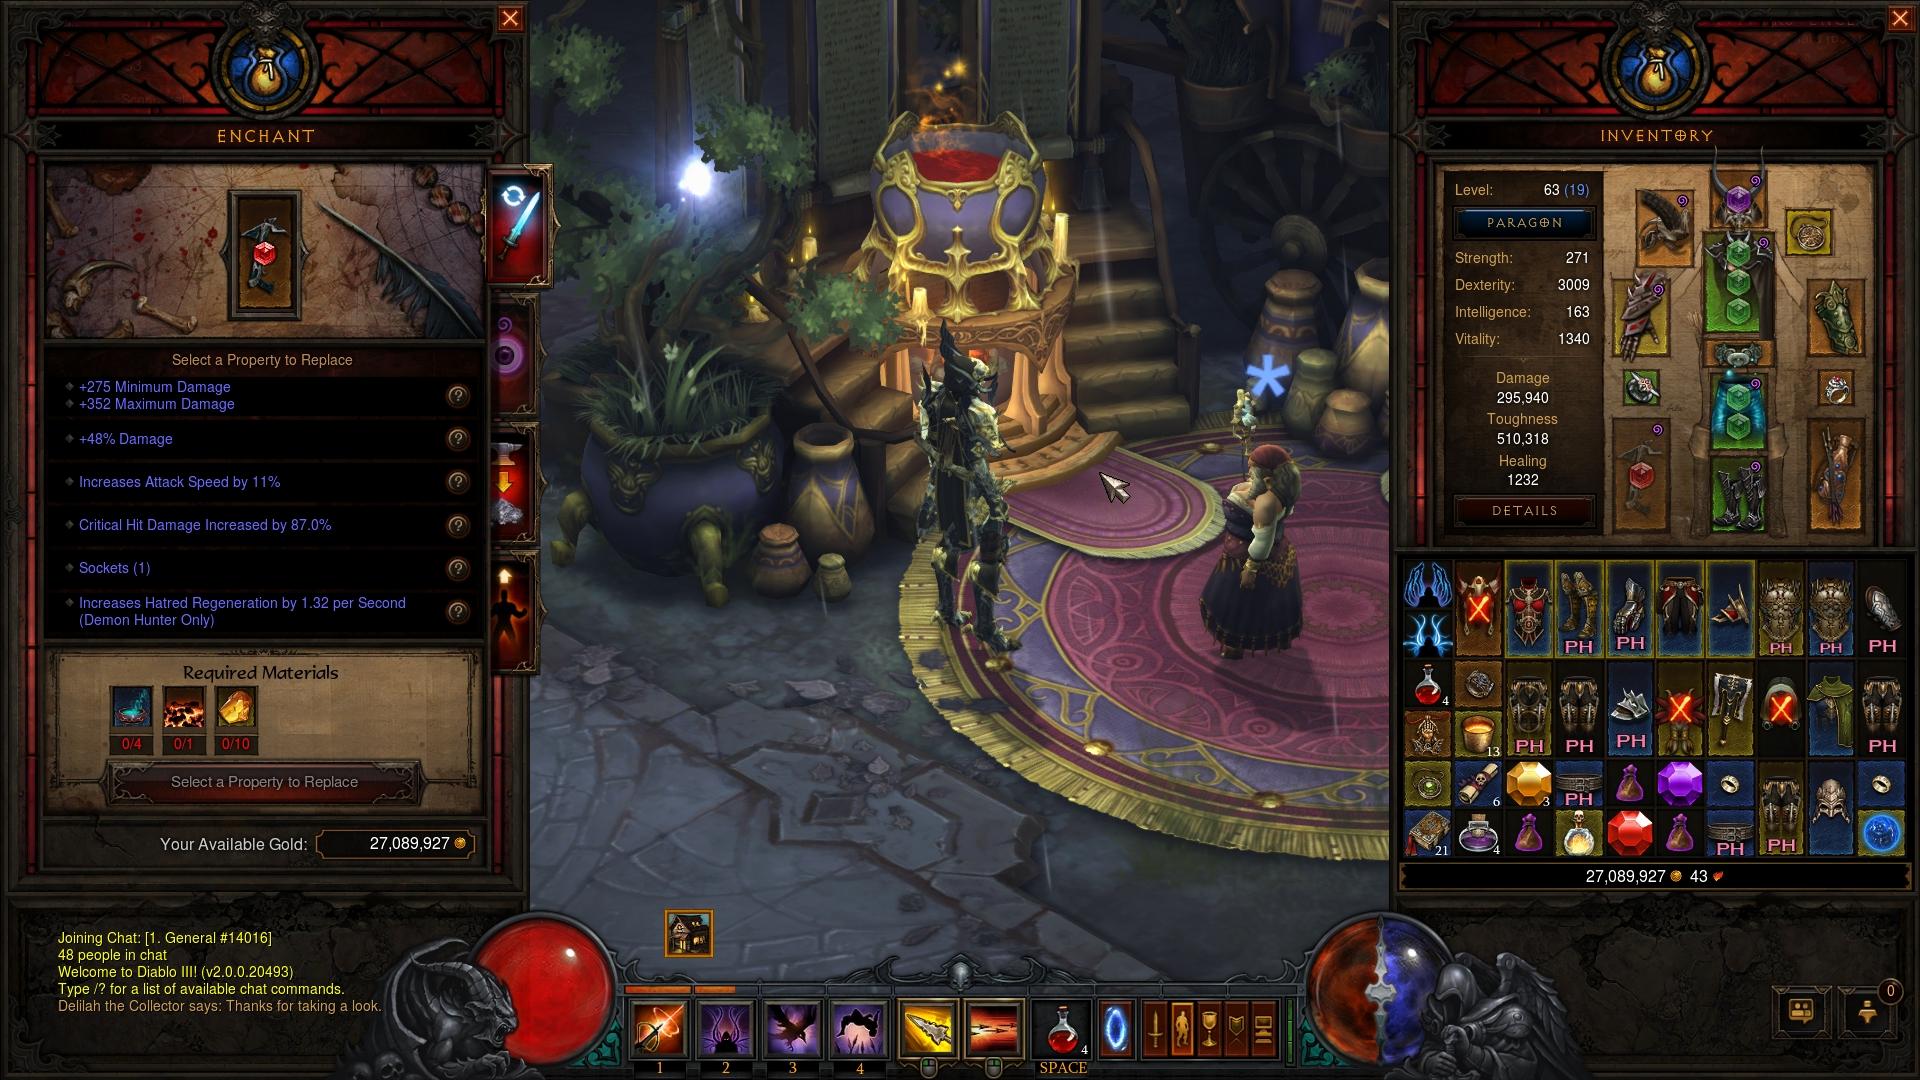 Imagenes De Diablo Iii Reaper Of Souls Meristation